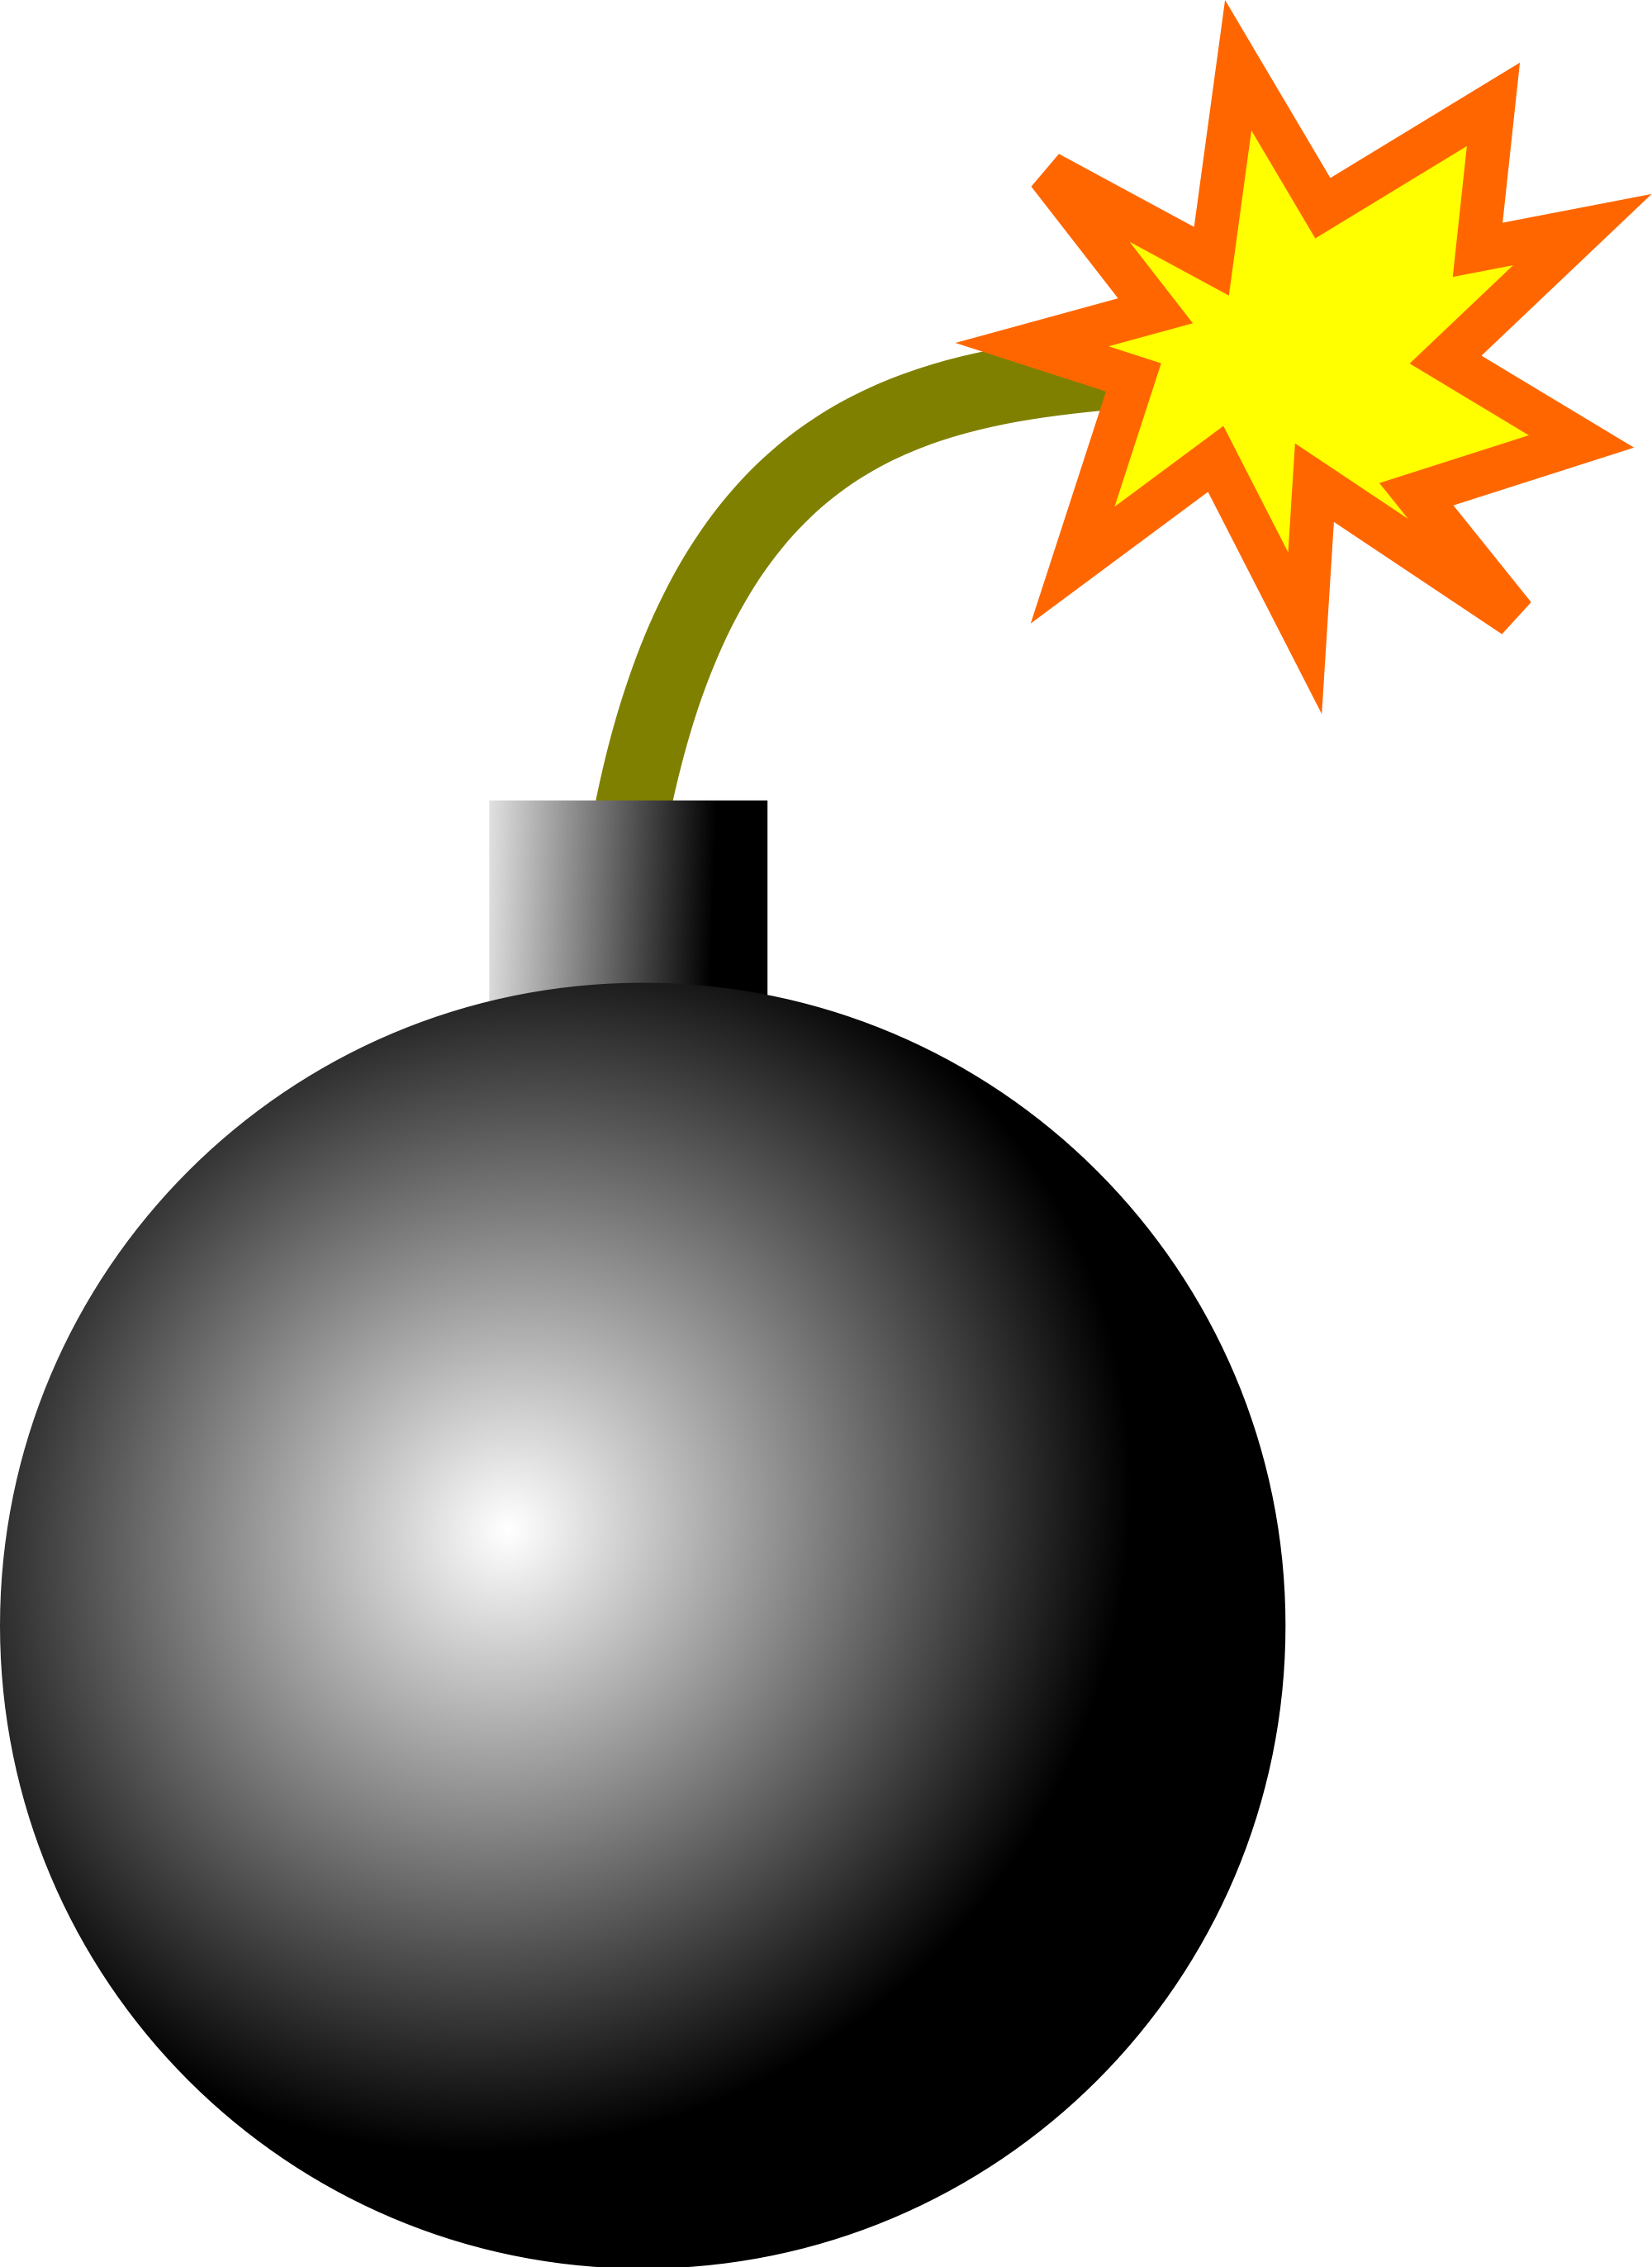 collection of no. Explosion clipart grenade explosion